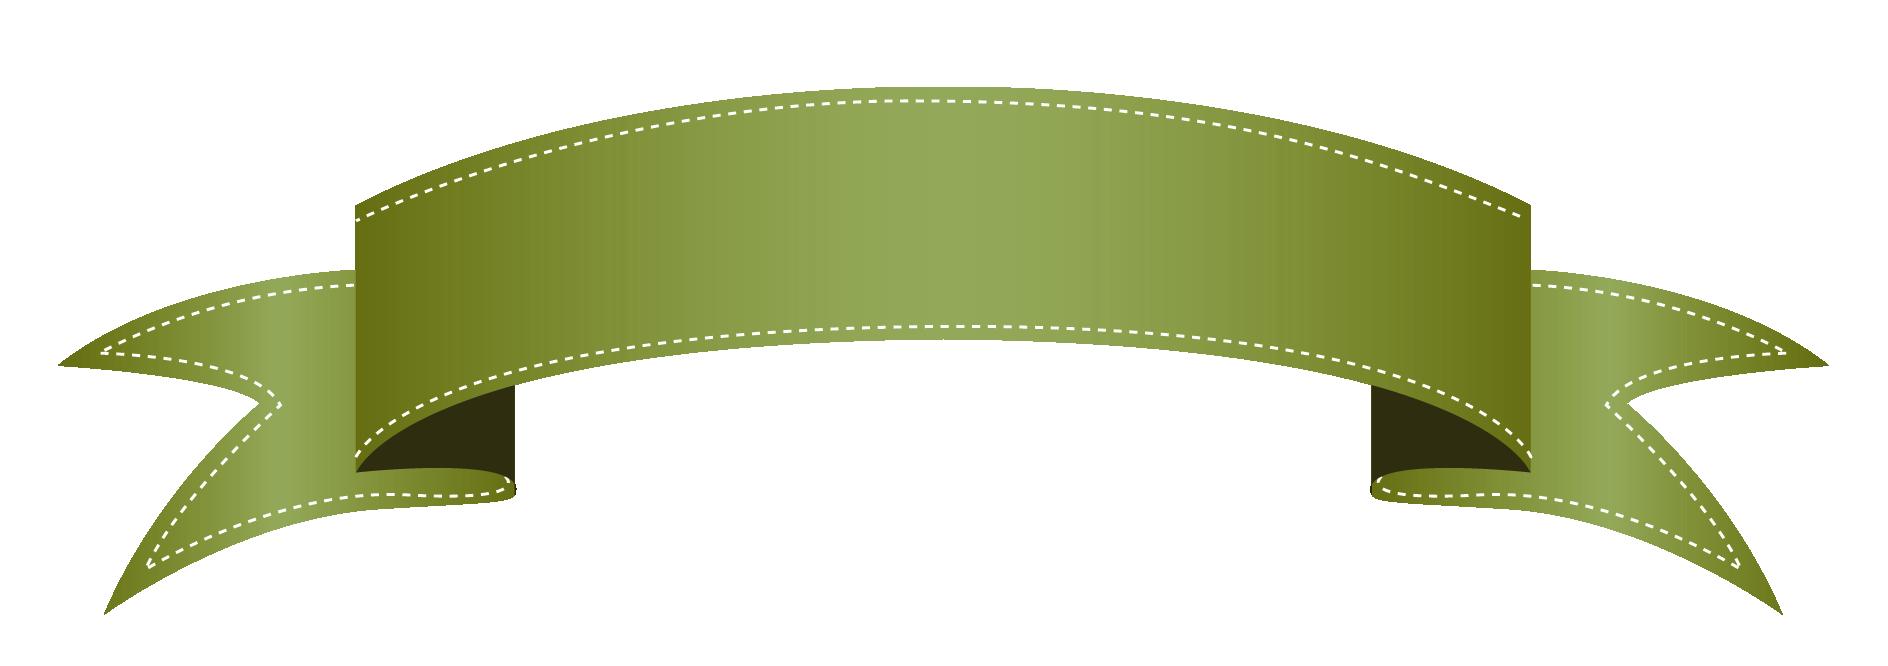 Banner clip art ribbon. Green transparent clipart nikhil